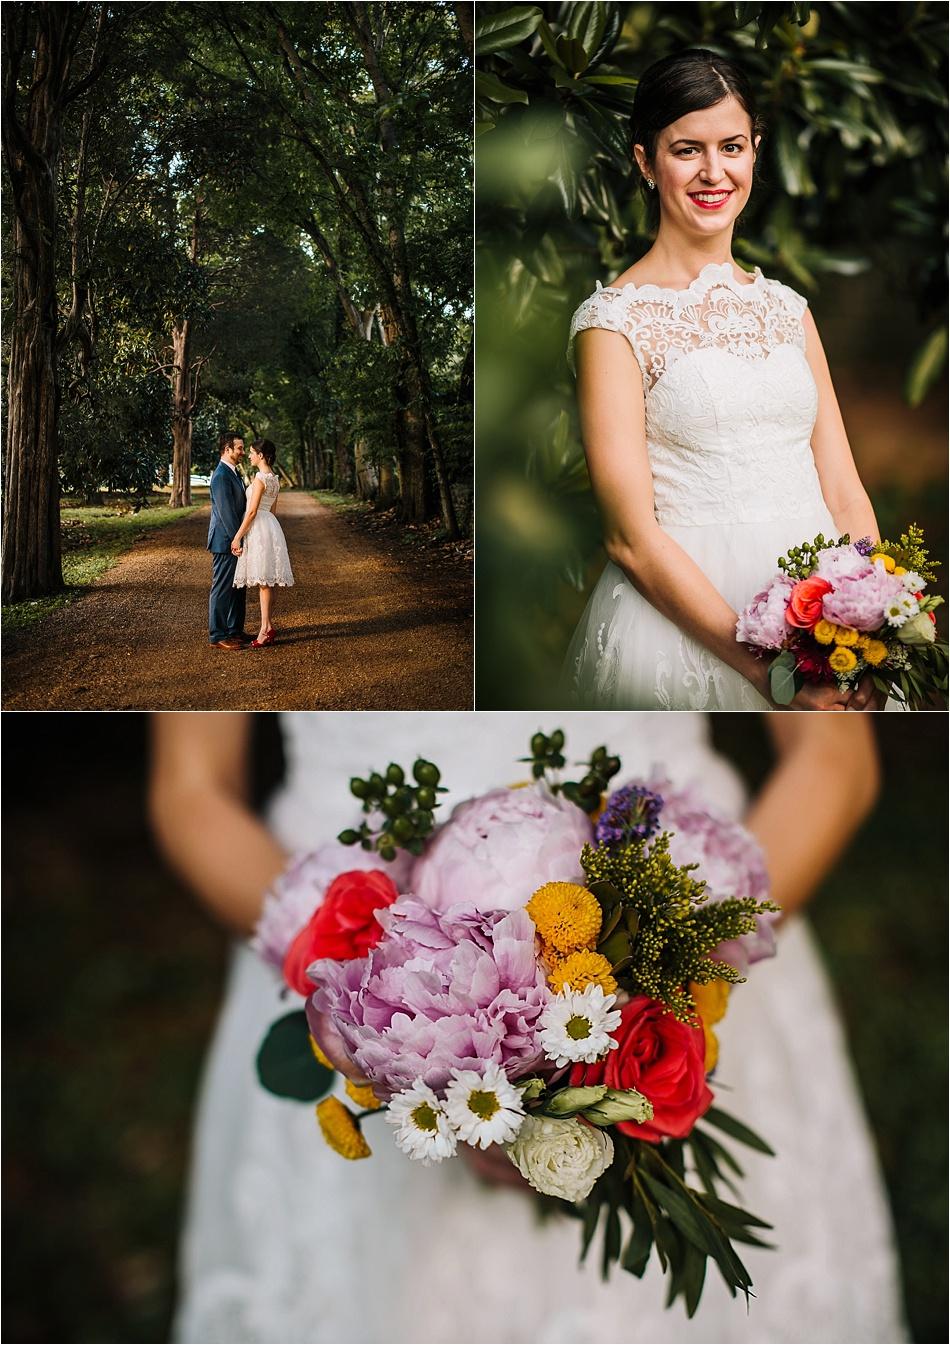 CK-Photo-Nashville-wedding-photographer-travellers-rest